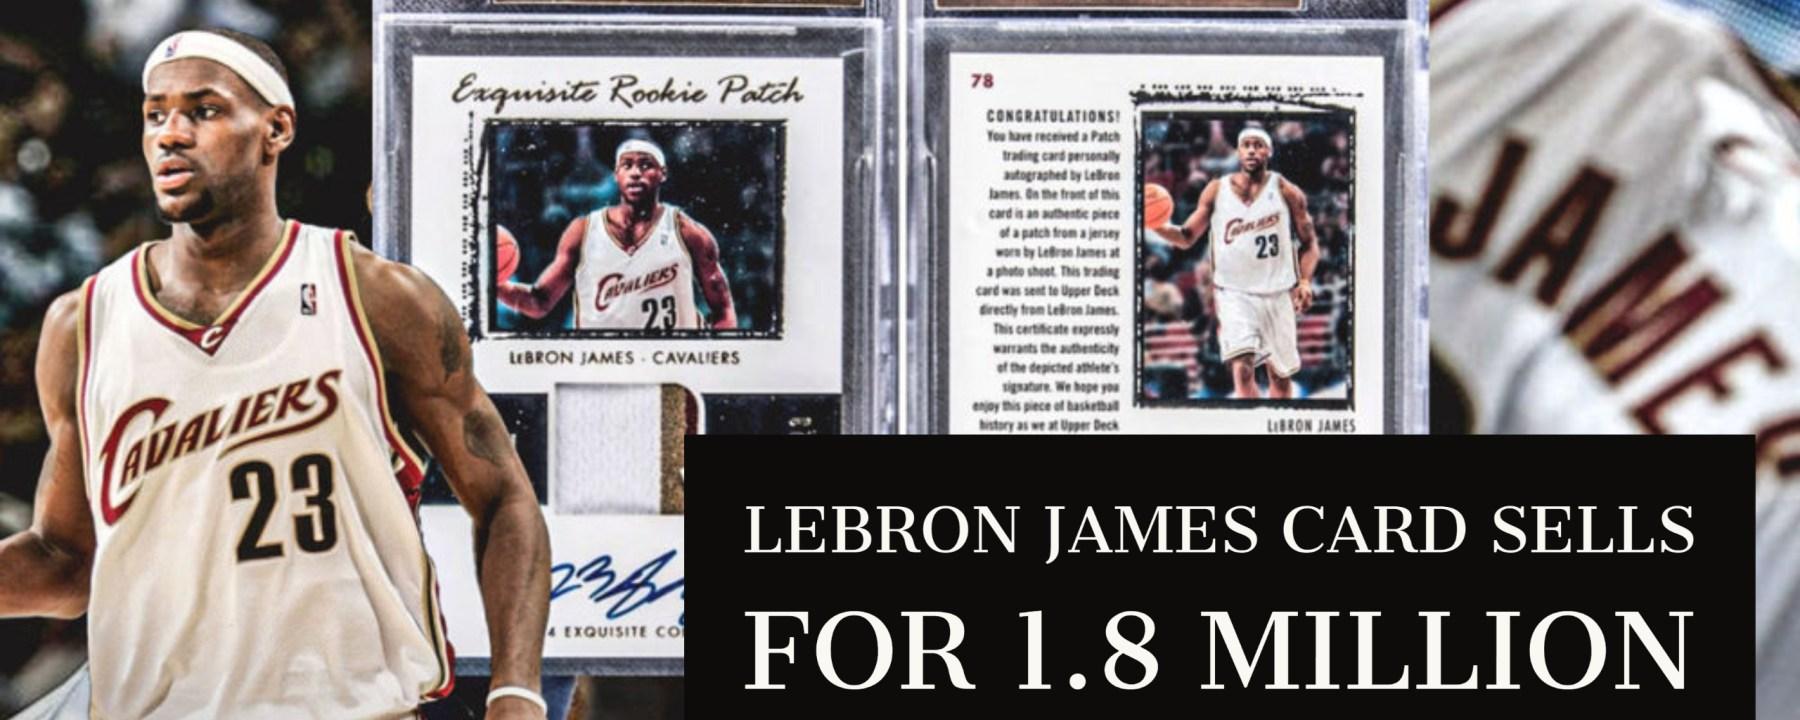 Lebron James Card 1.8 million